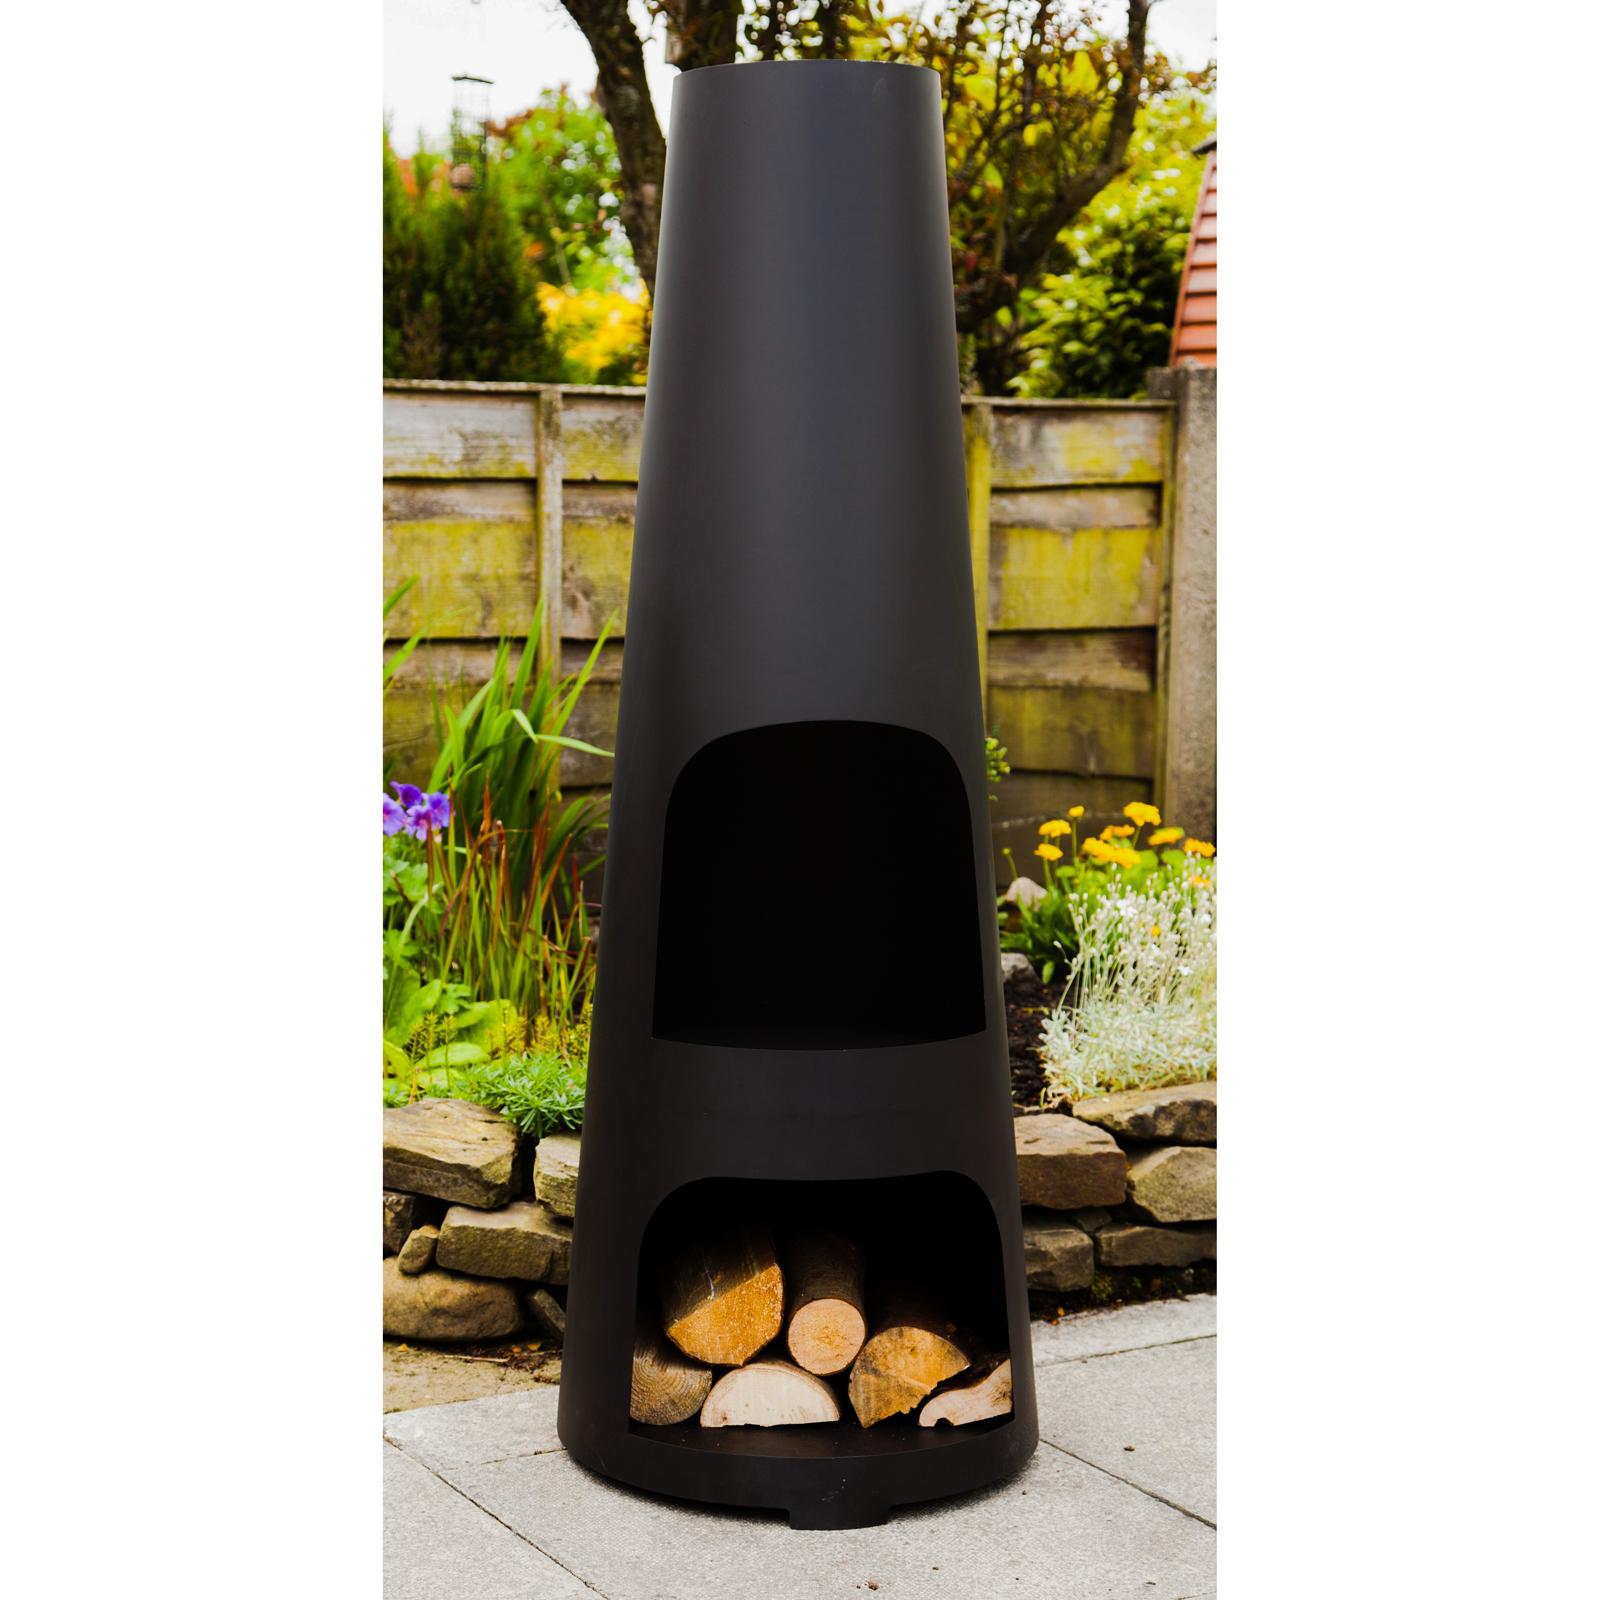 Superb Made Ou0027 Metal Garden Patio Fire Chimney Heater Large Steel Wood Burner  Chimenea